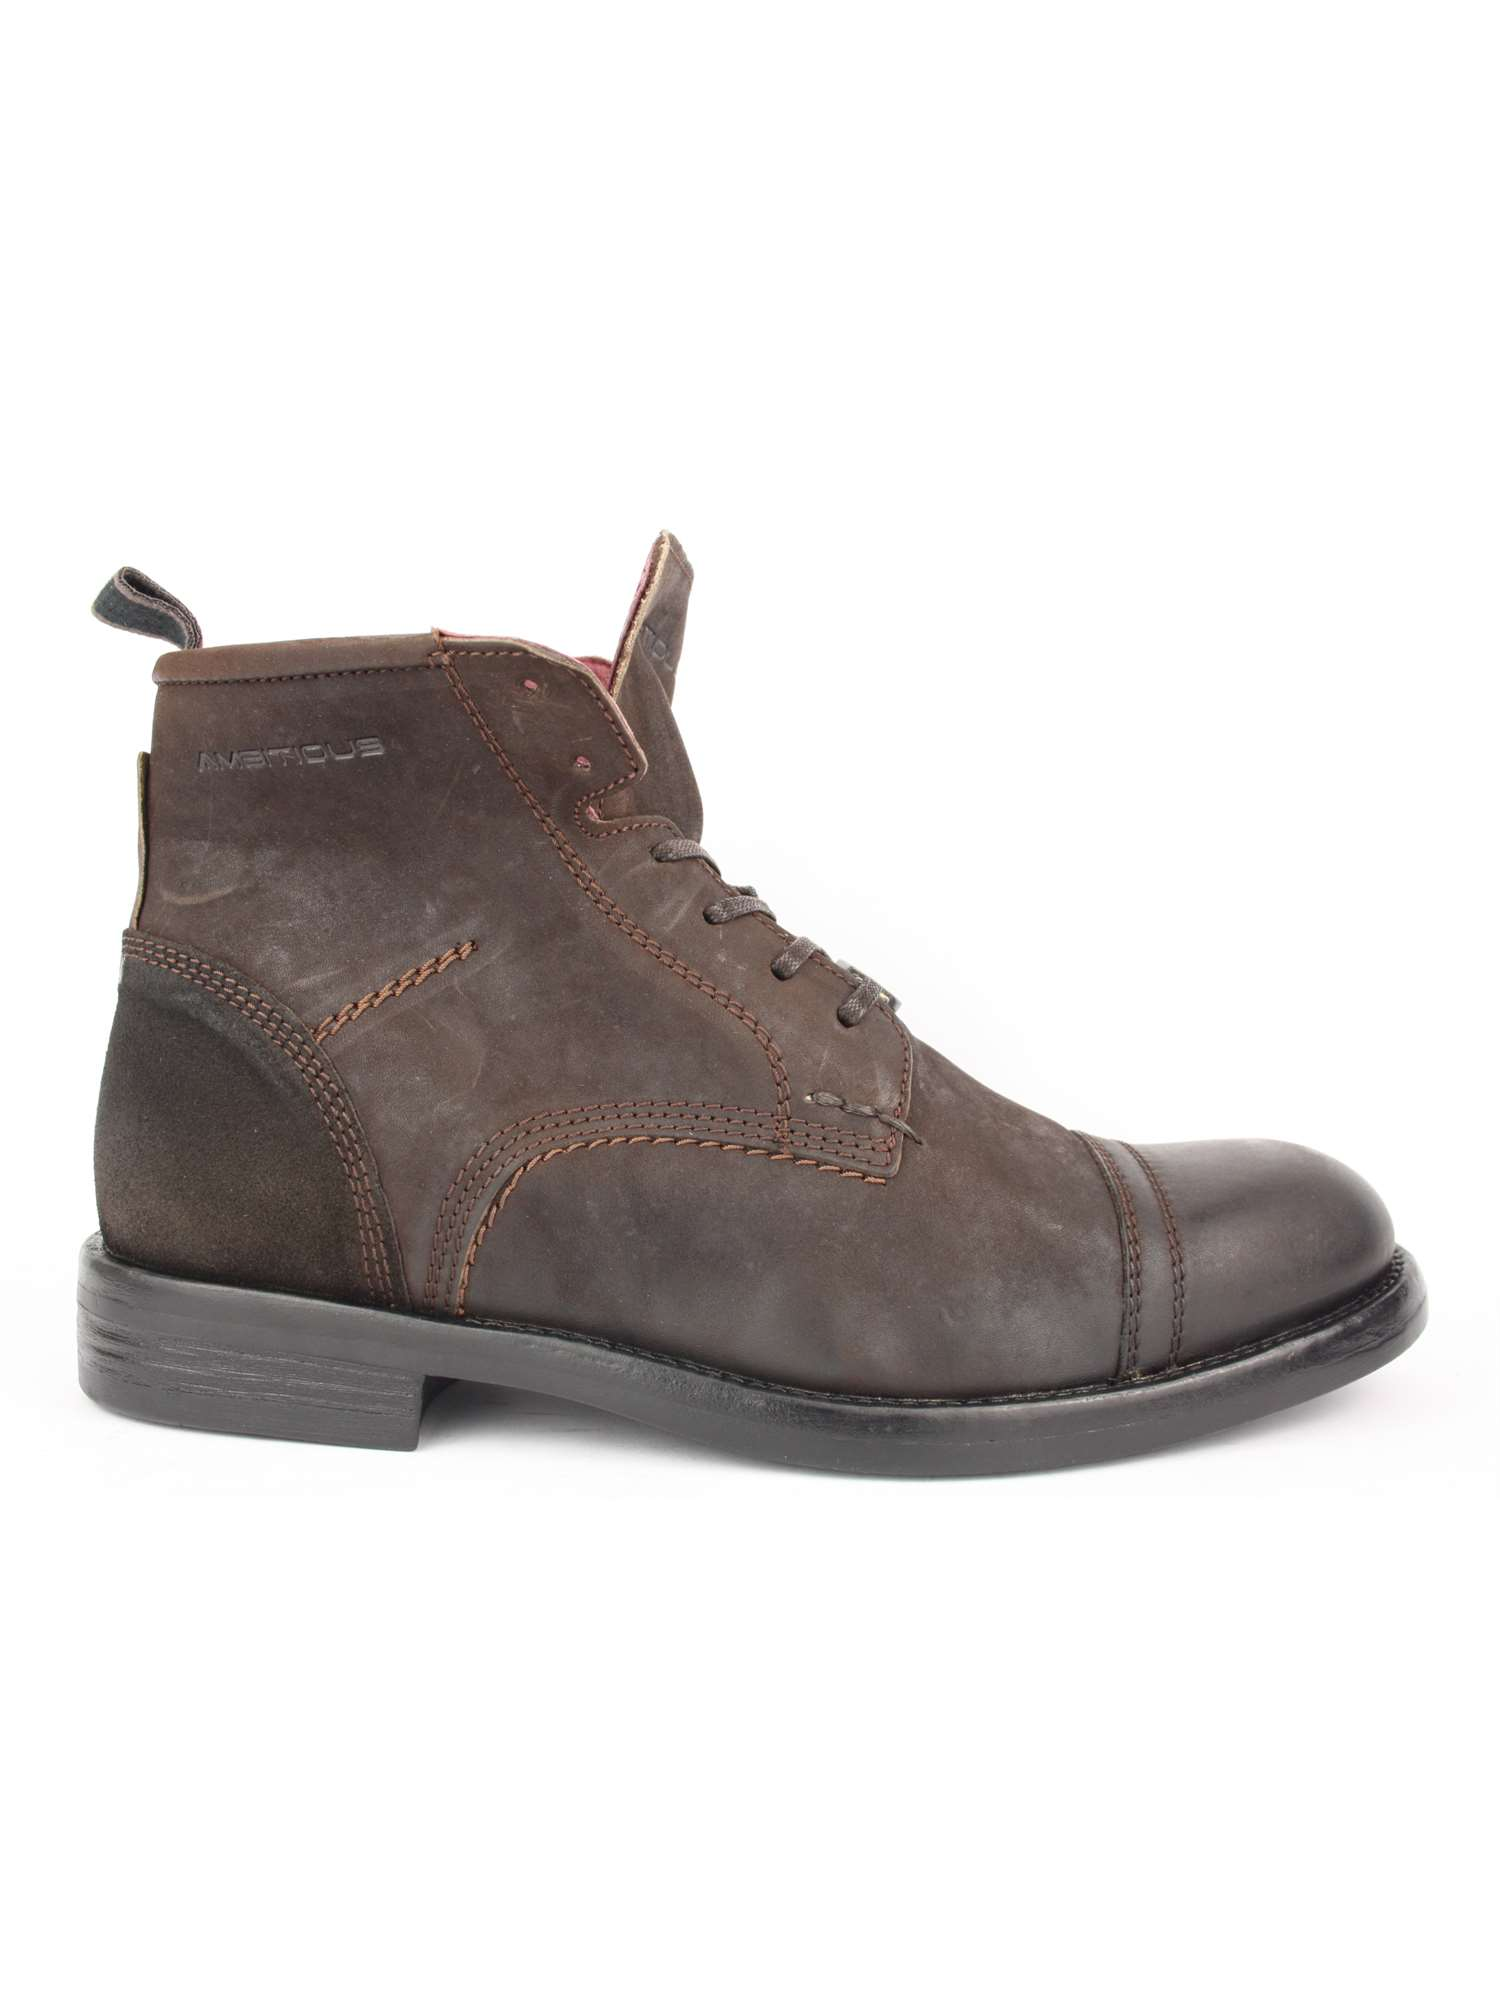 Ambitious Shoes 4953 Marron Scarpe Uomo 9cb23be638a